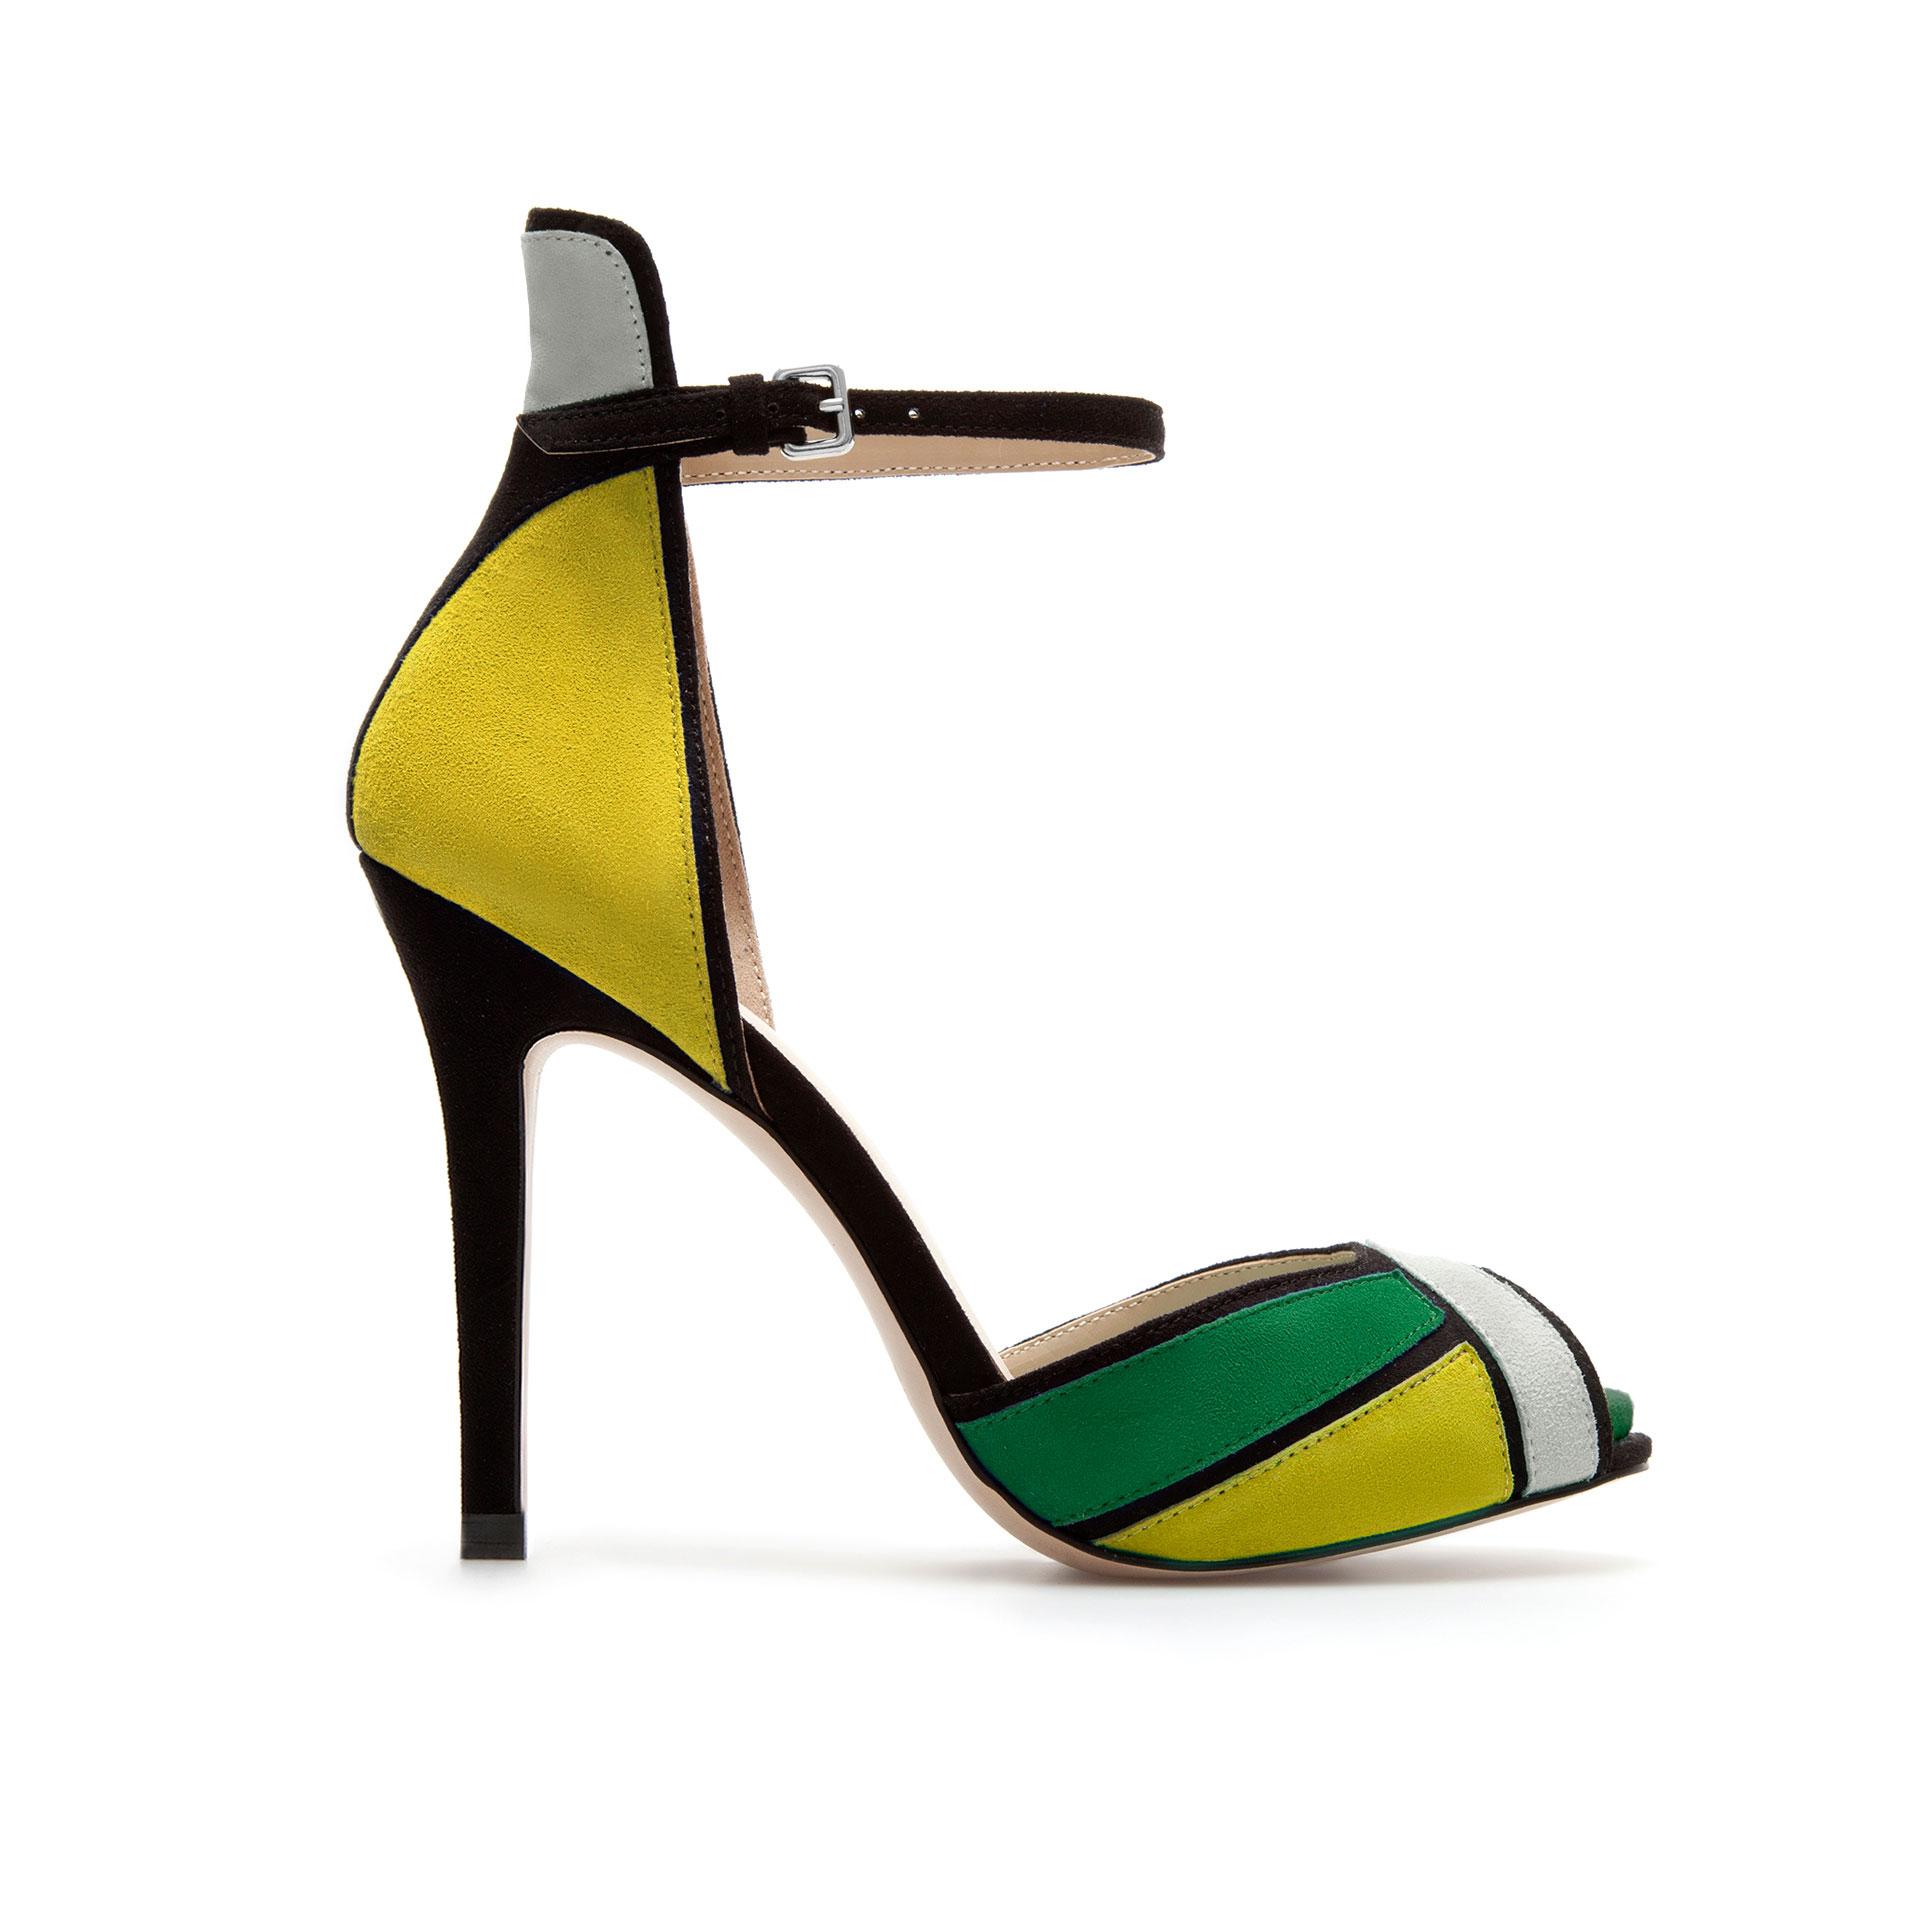 Green Ankle Strap Heels | Tsaa Heel